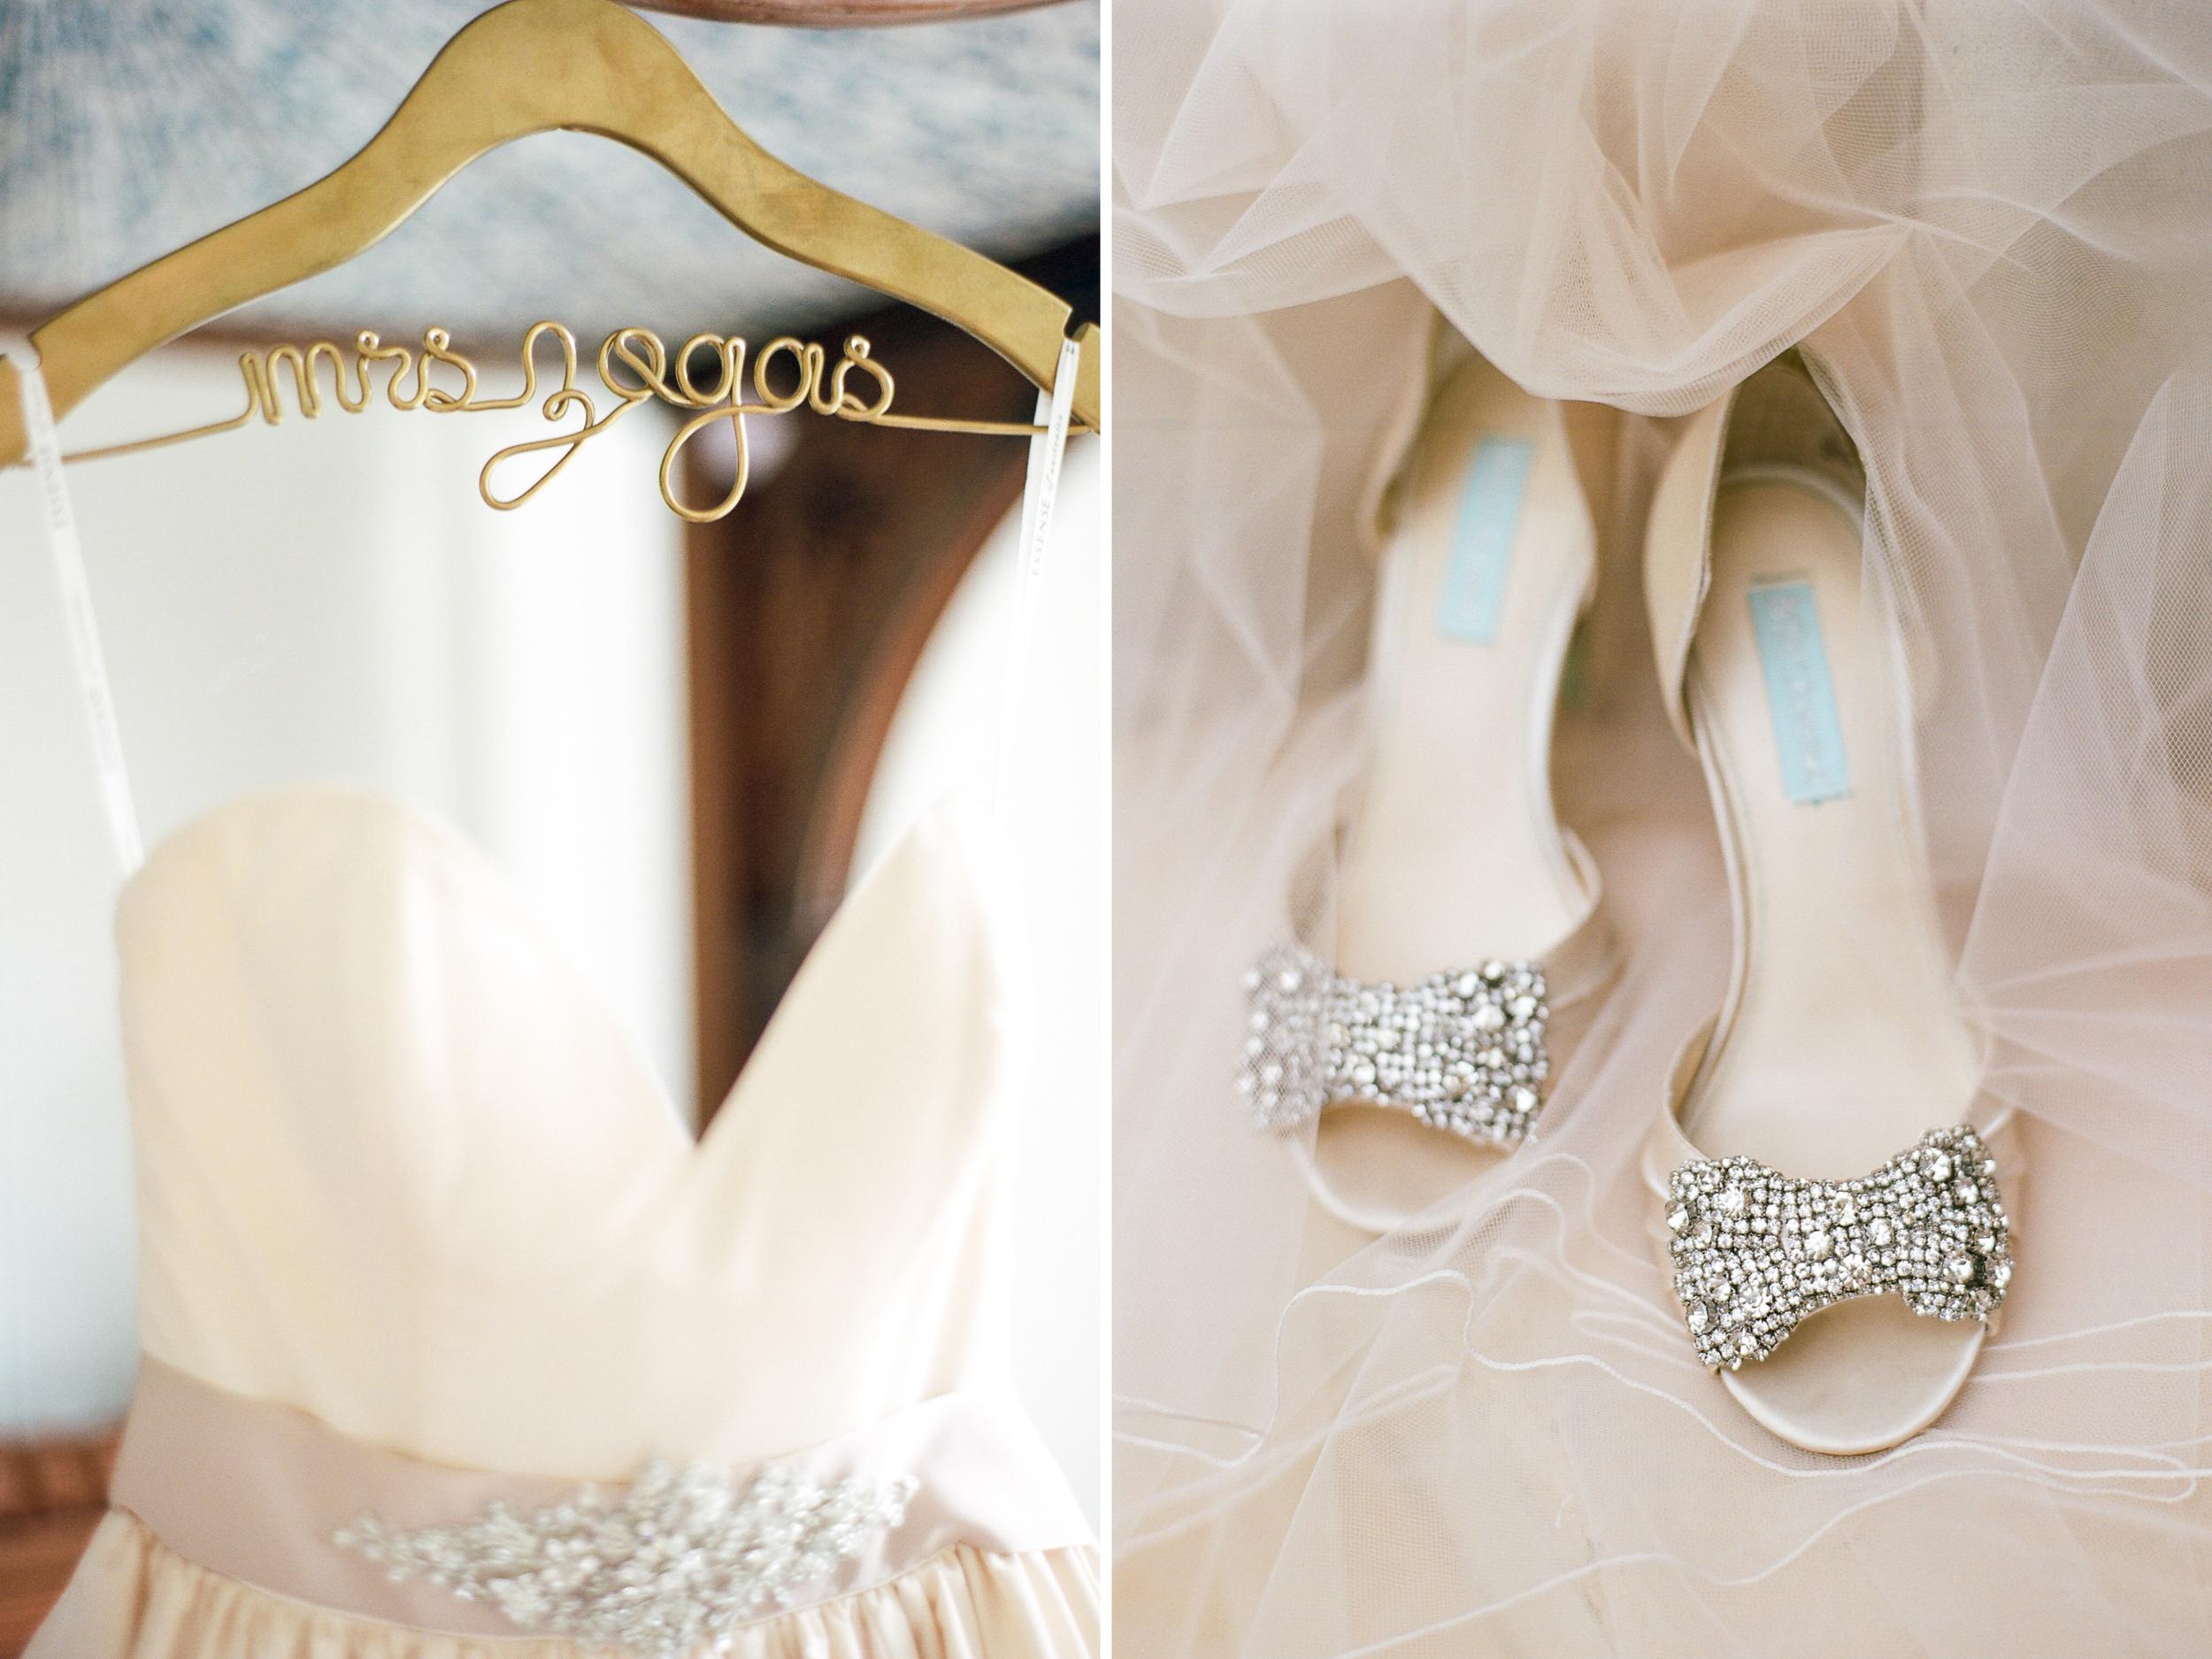 Dana-Fernandez-Photography-Houston-Wedding-Photographer-Style-Me-Pretty-Film-Texas-Destination-Photographer-103.jpg